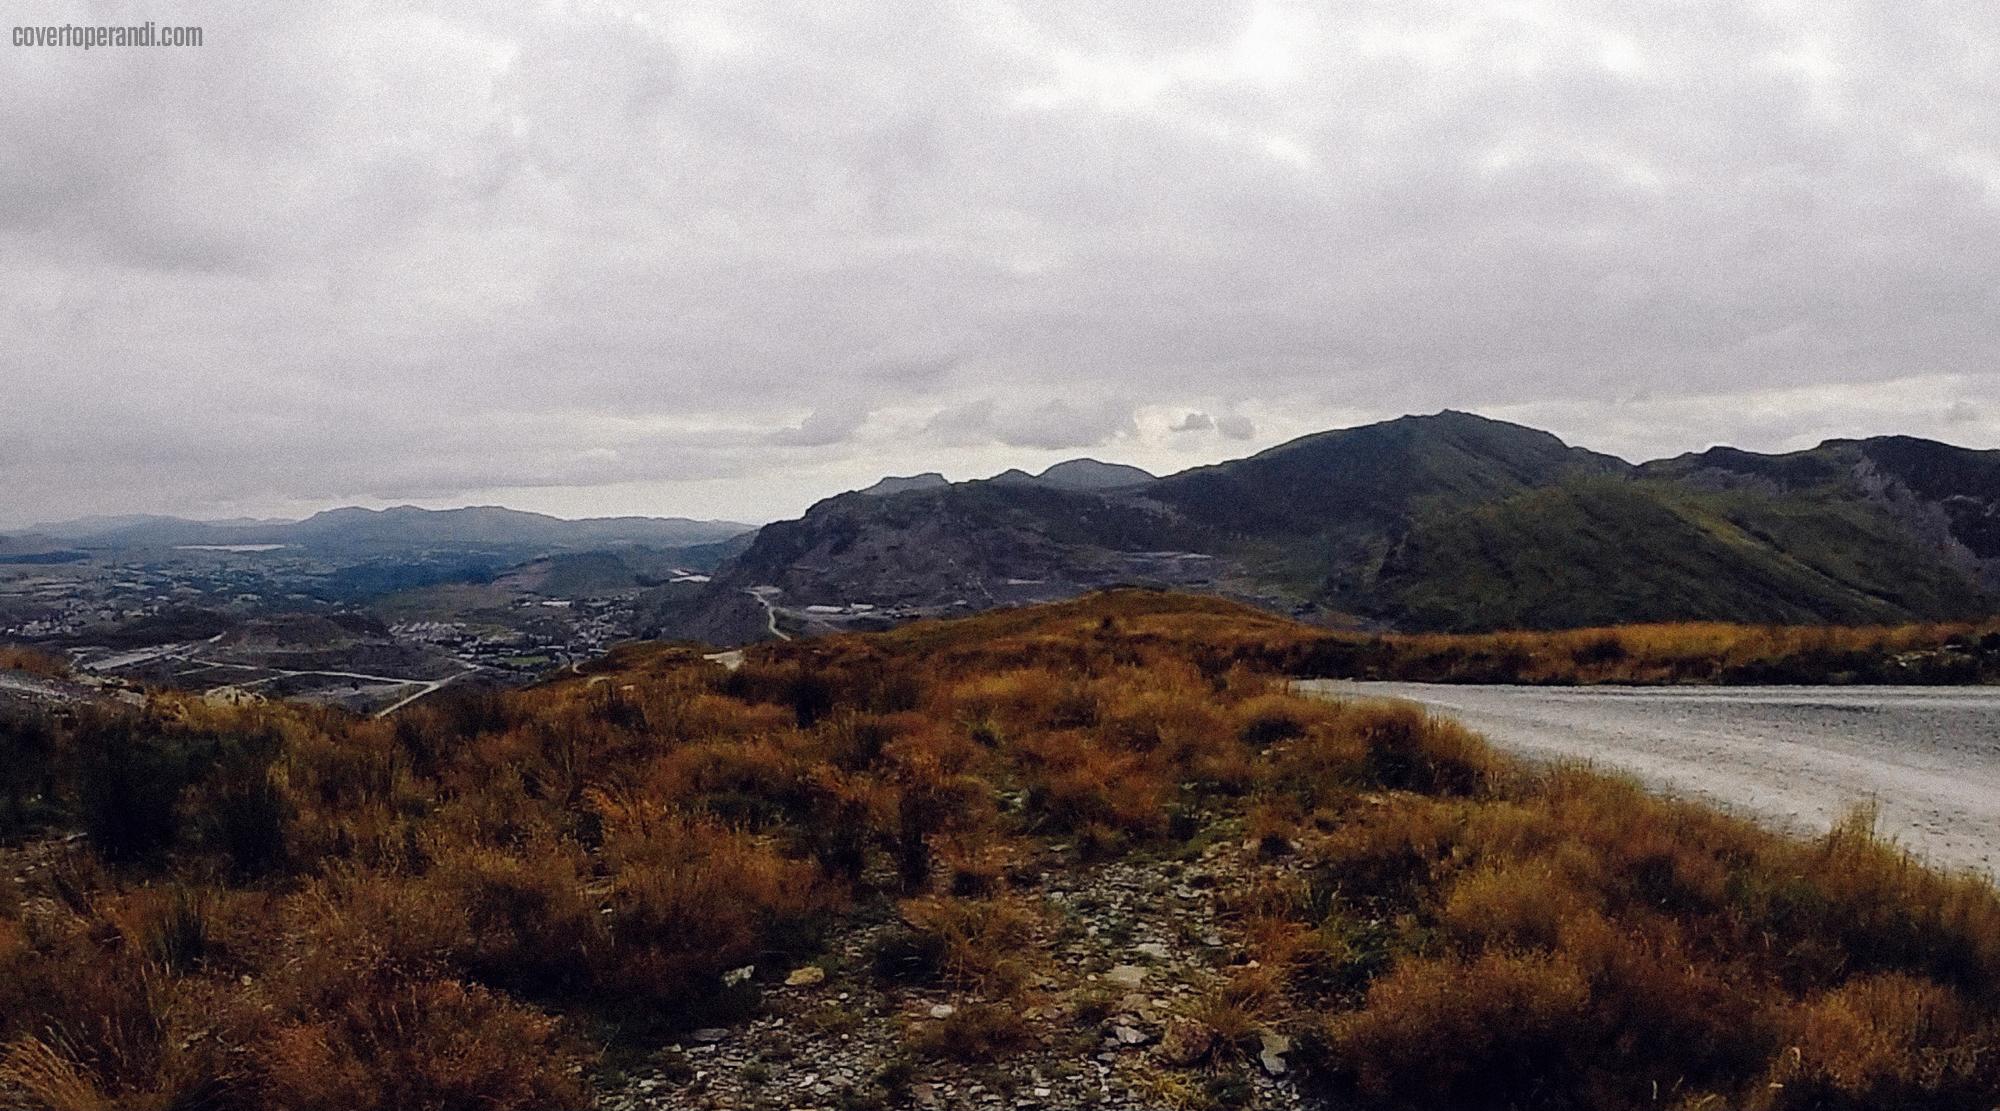 Covert Operandi - 2014 Wales-26.jpg